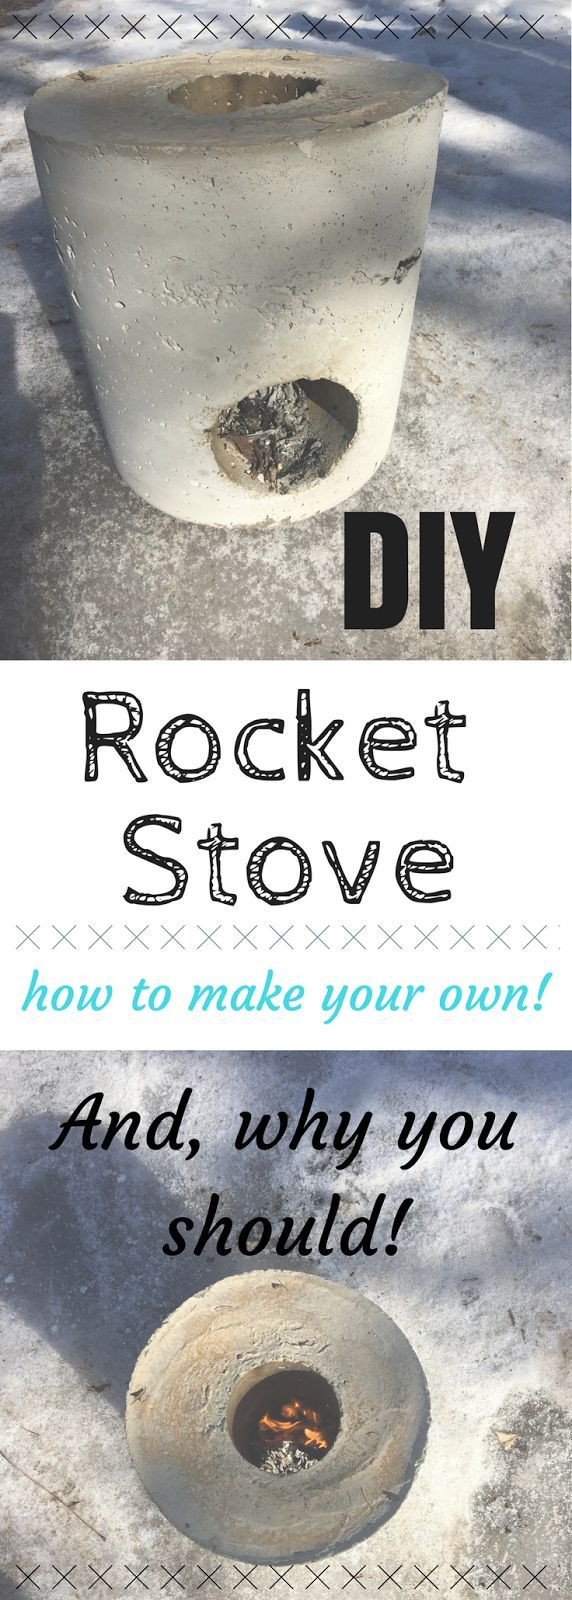 Best 25 rocket stove design ideas on pinterest for Build your own rocket stove